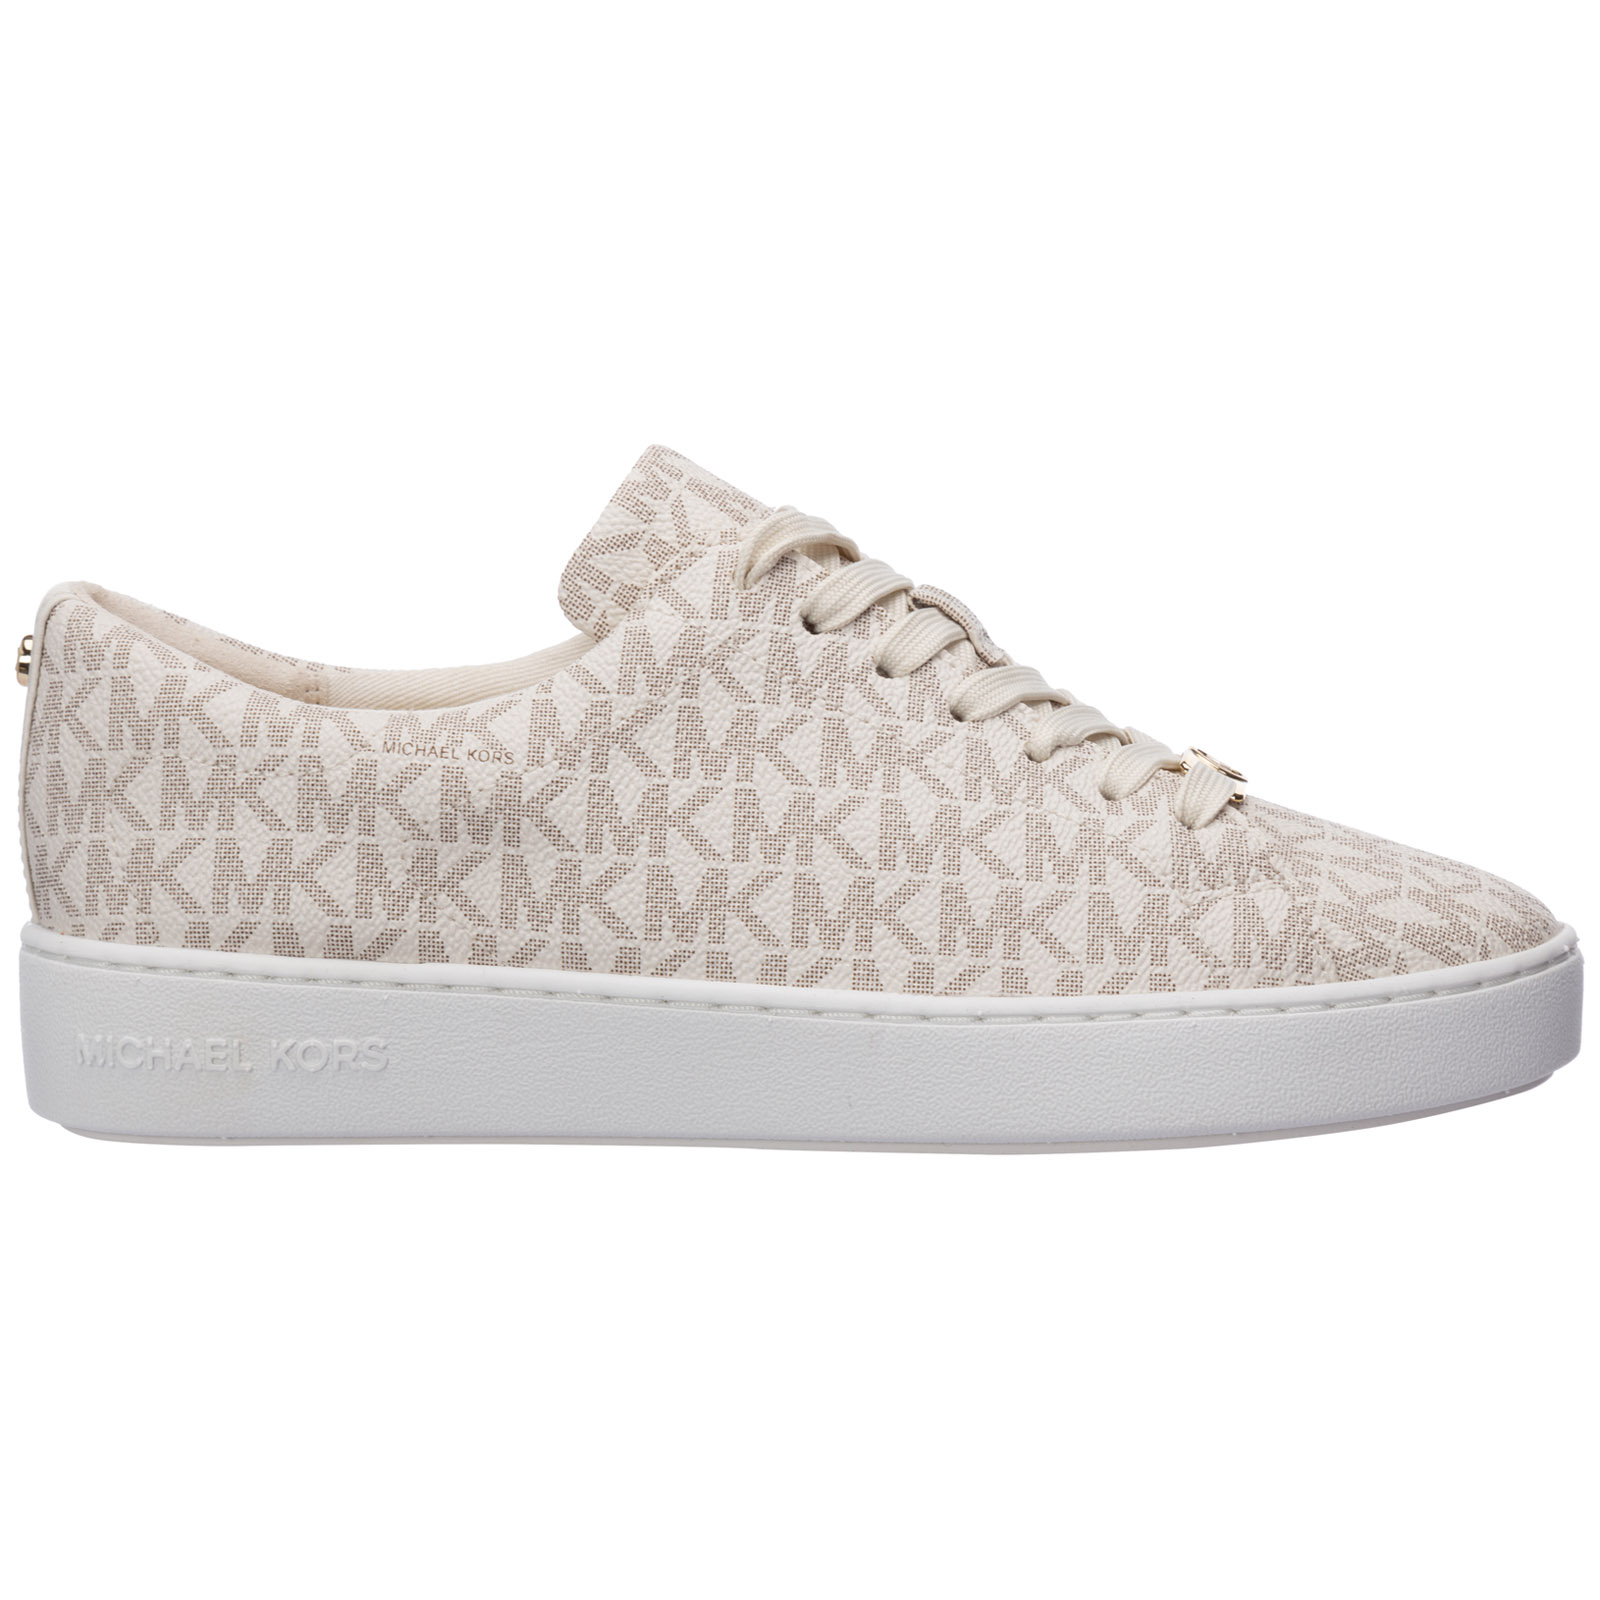 Sneakers Michael Kors keaton 43R5KTFP1B